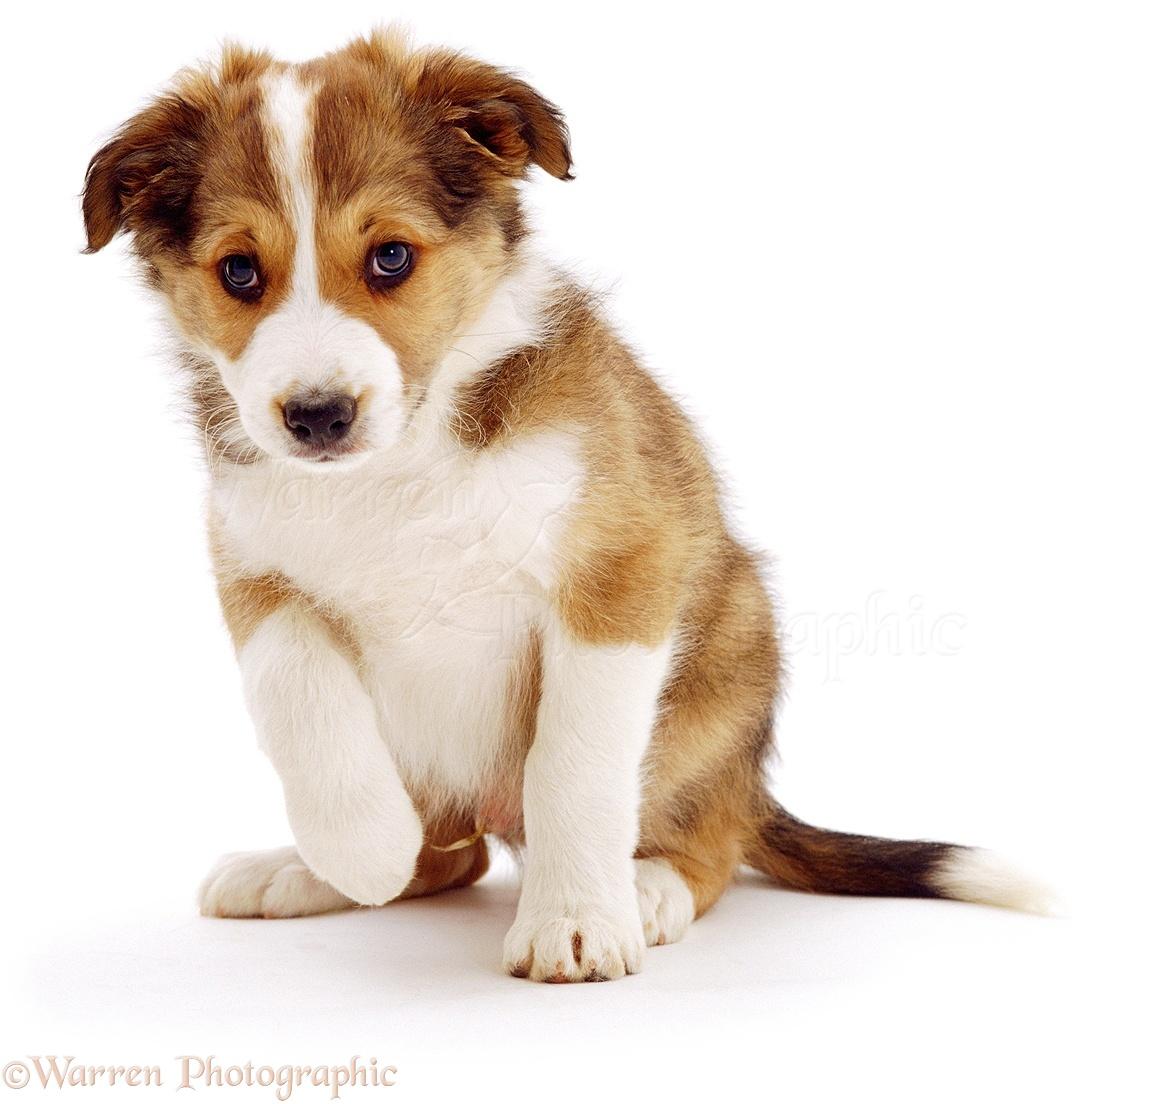 Dog Cute Puppy Photo Wp00837